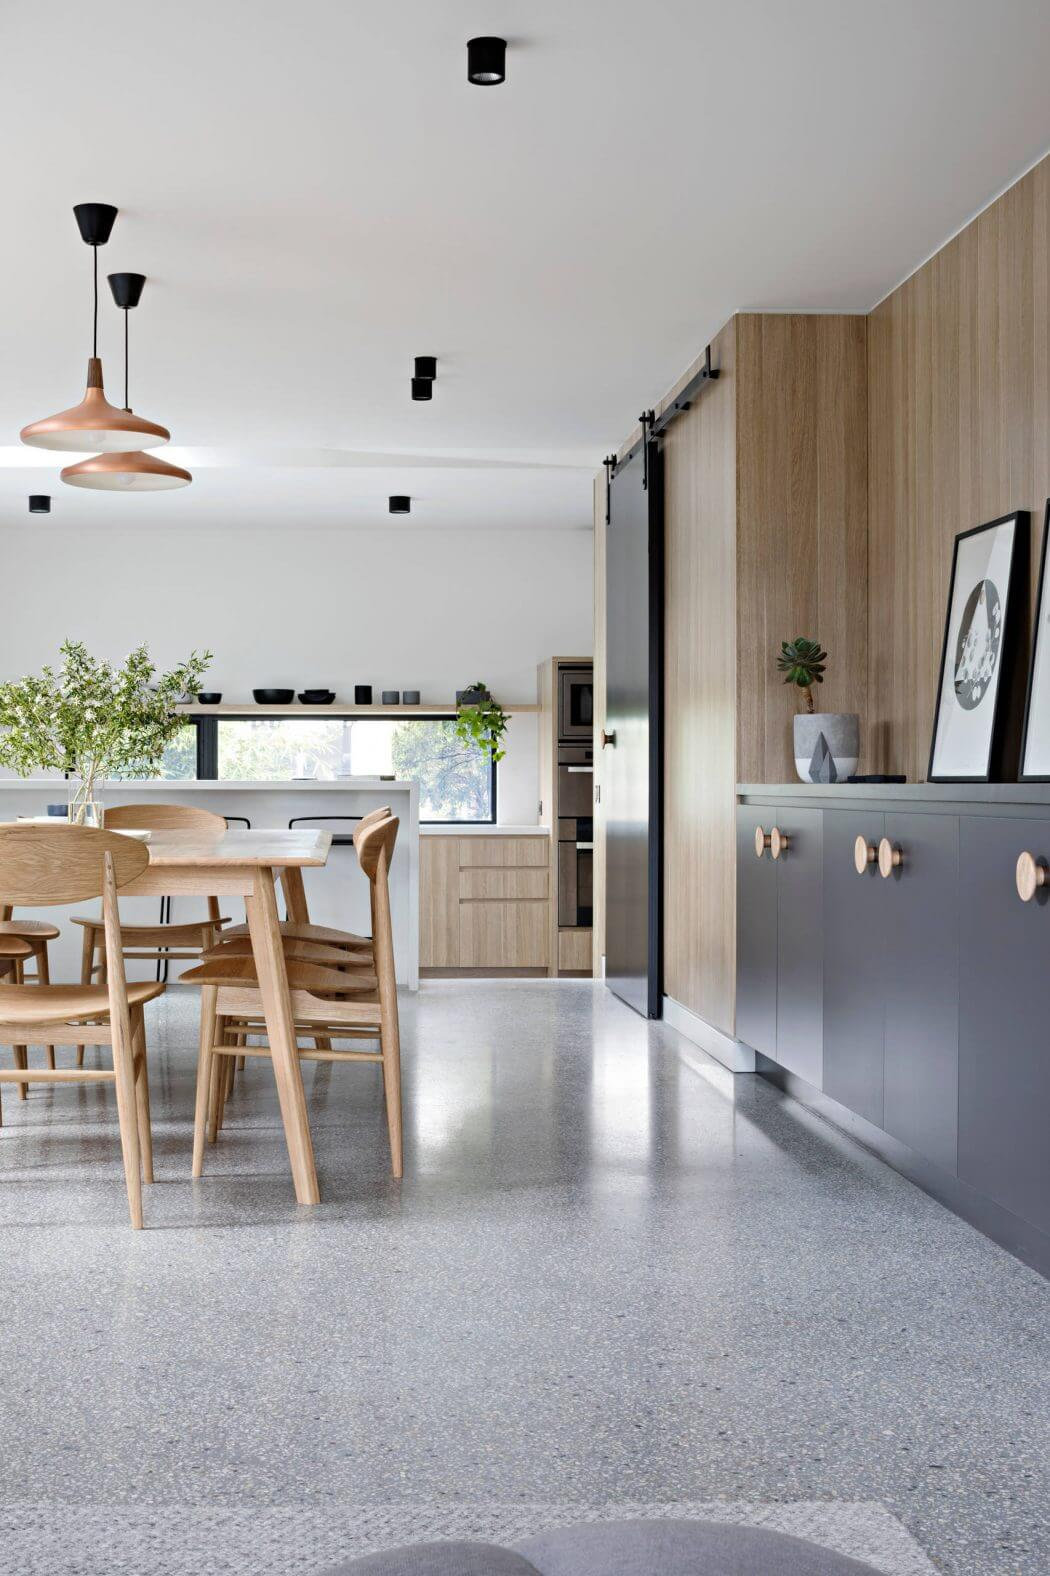 006-ruffey-lake-house-inbetween-architecture-1050x1576